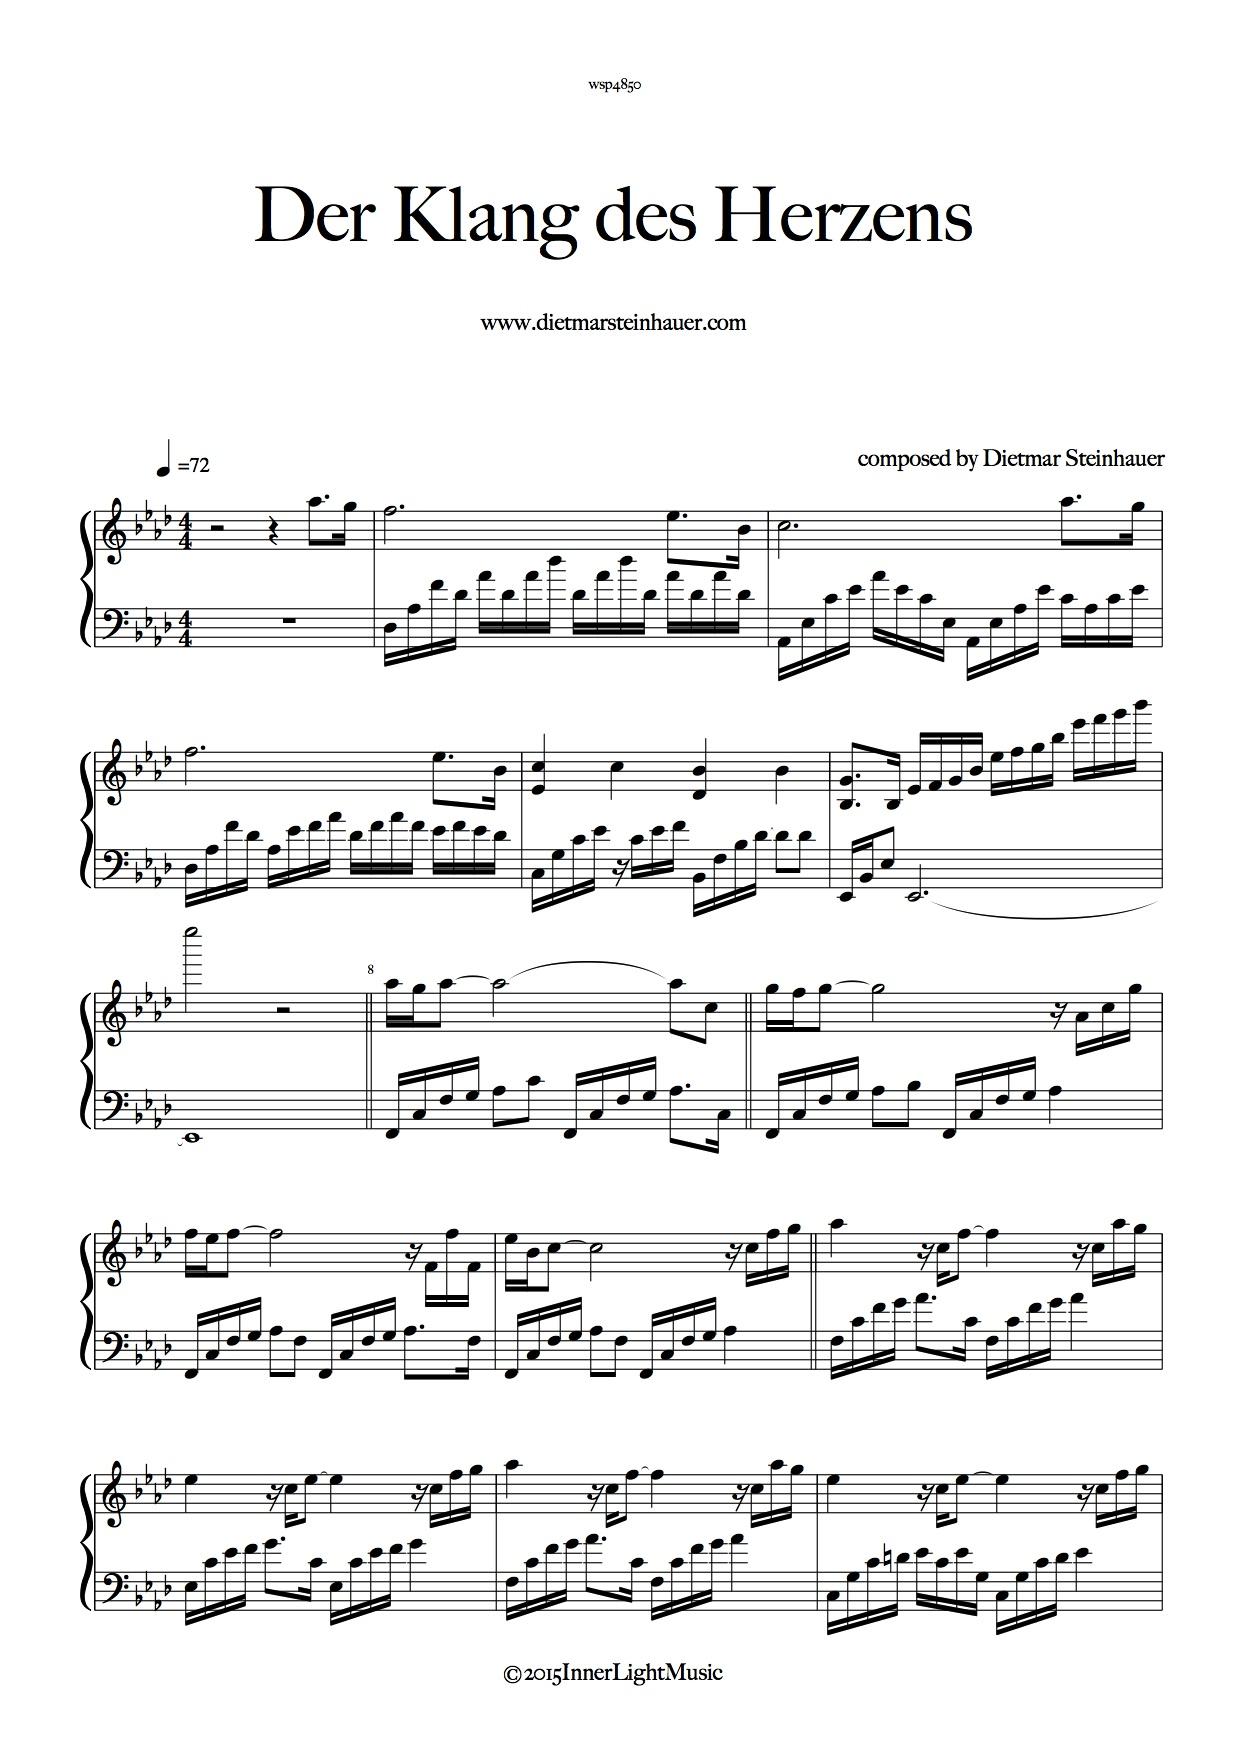 Der Klang des Herzens - The Sound of your Heart - tastenland